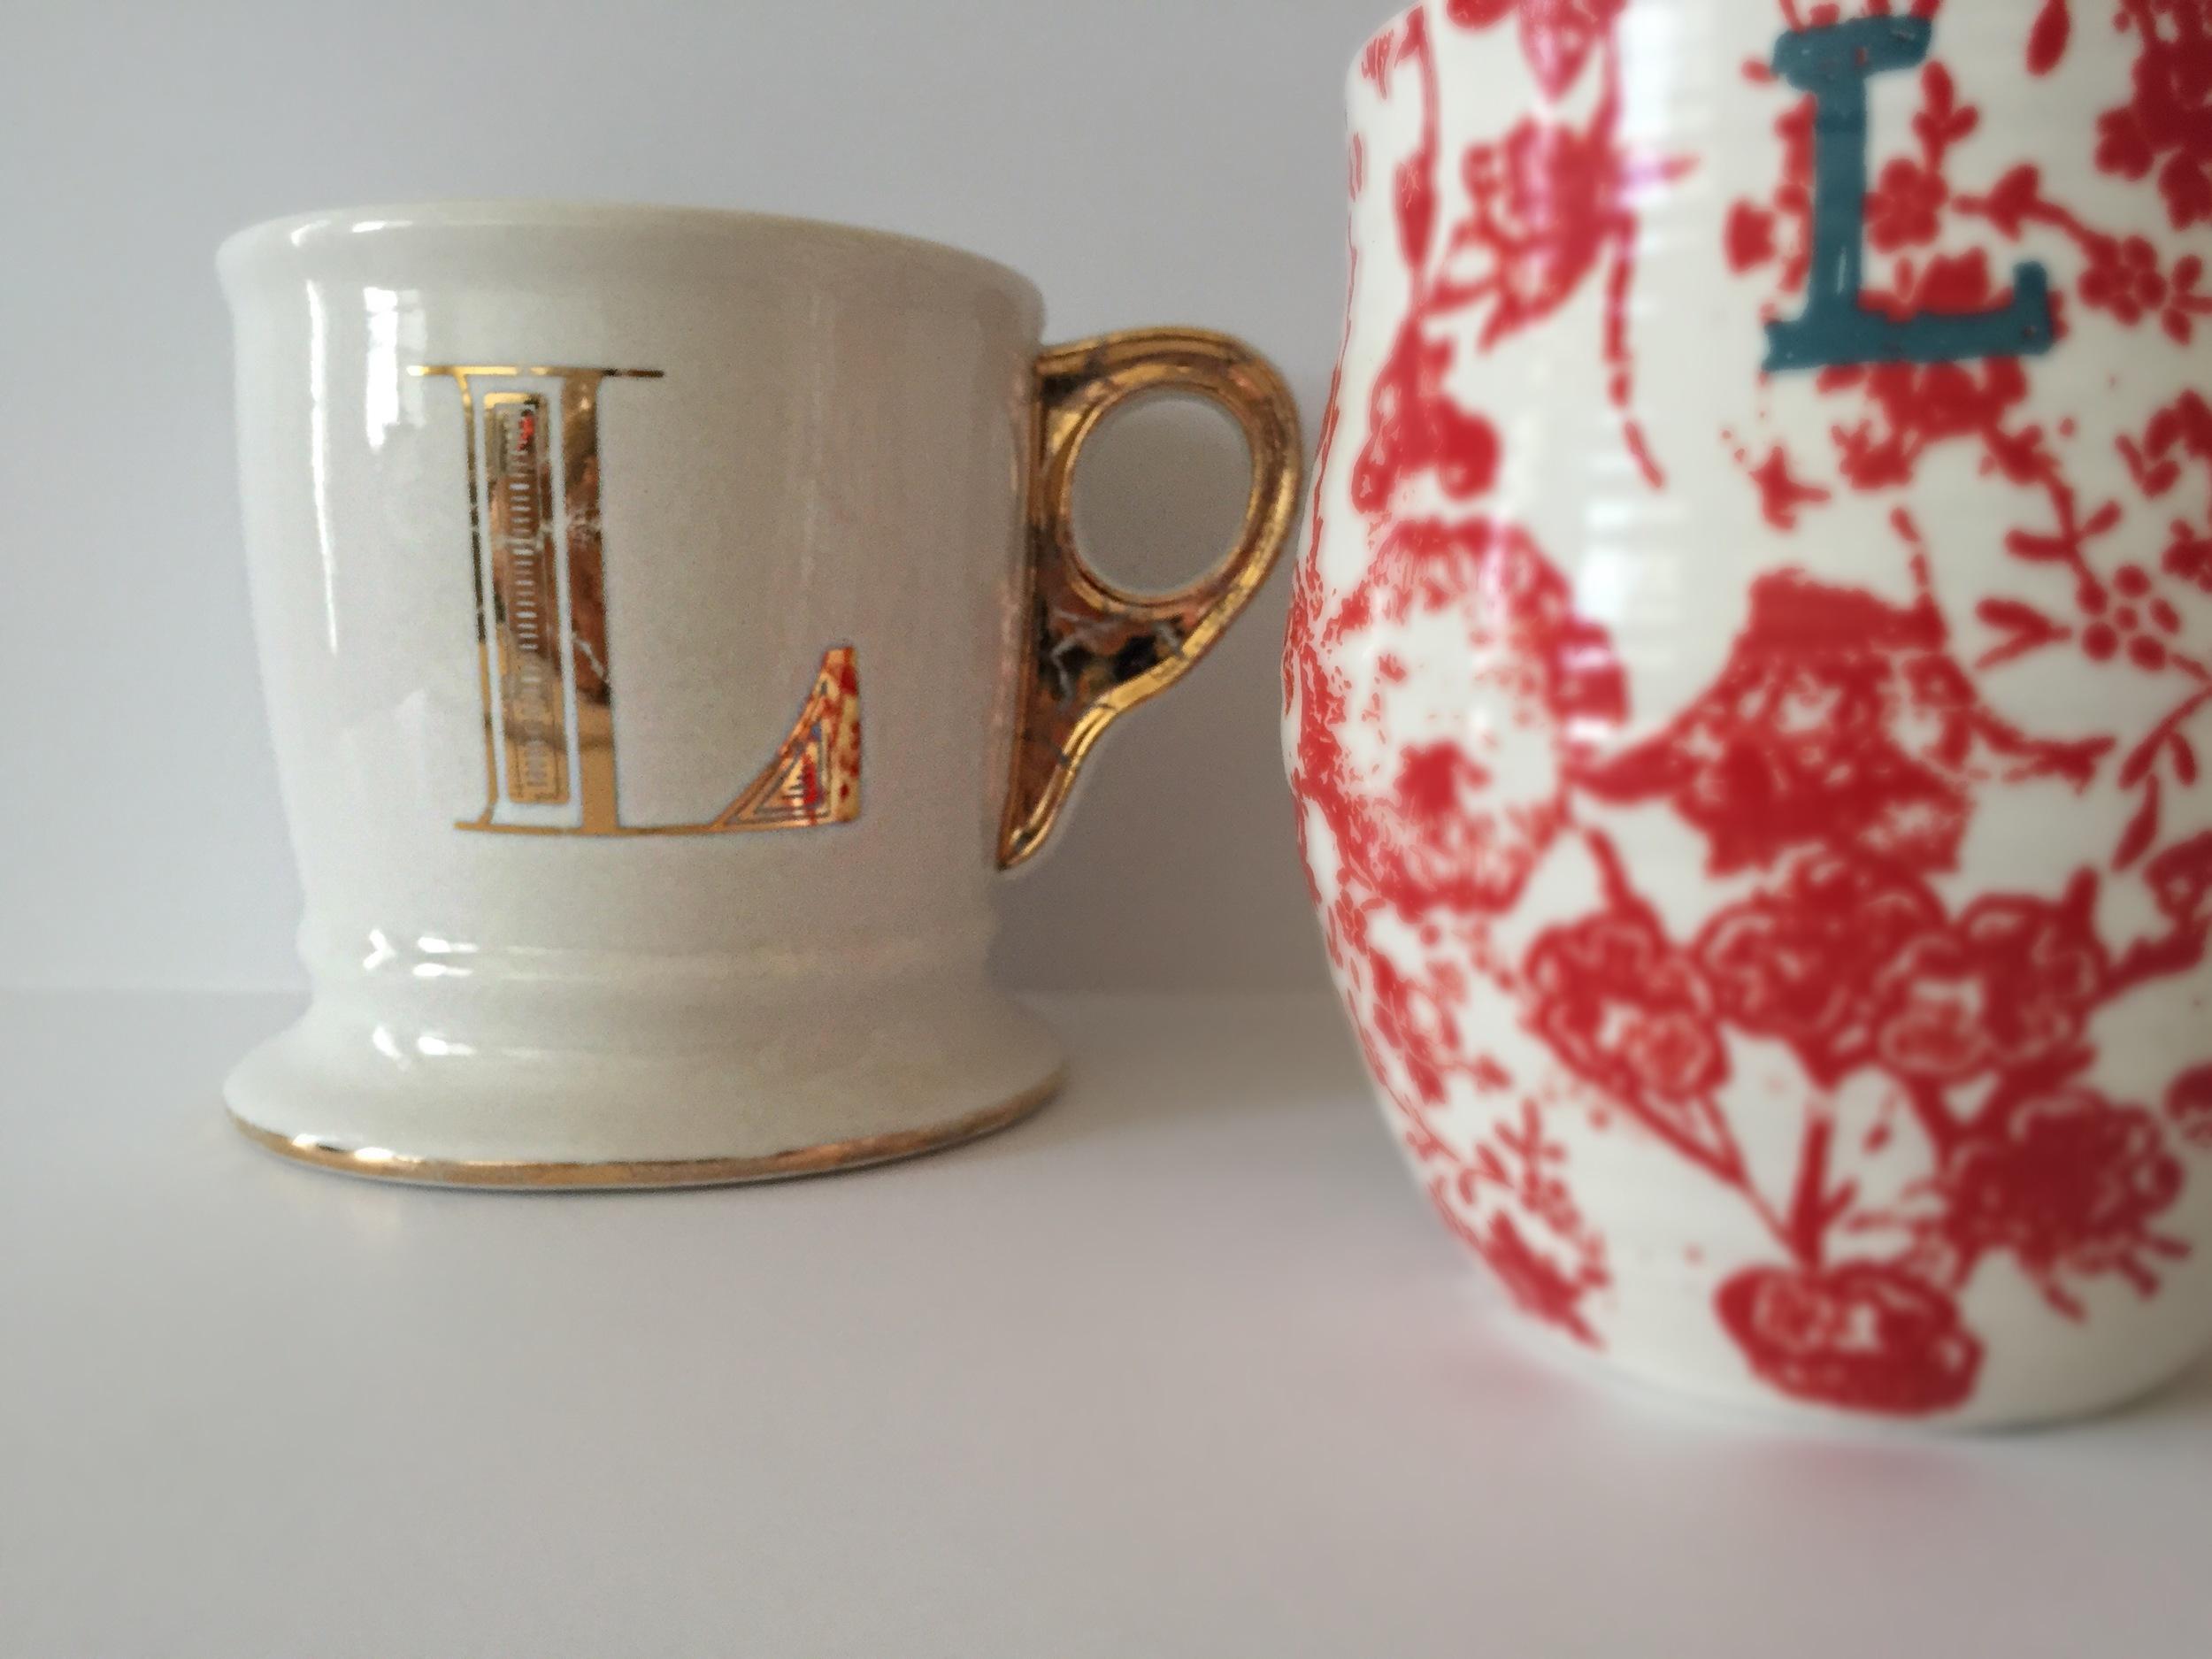 anthro coffee mugs | Oil & Grain